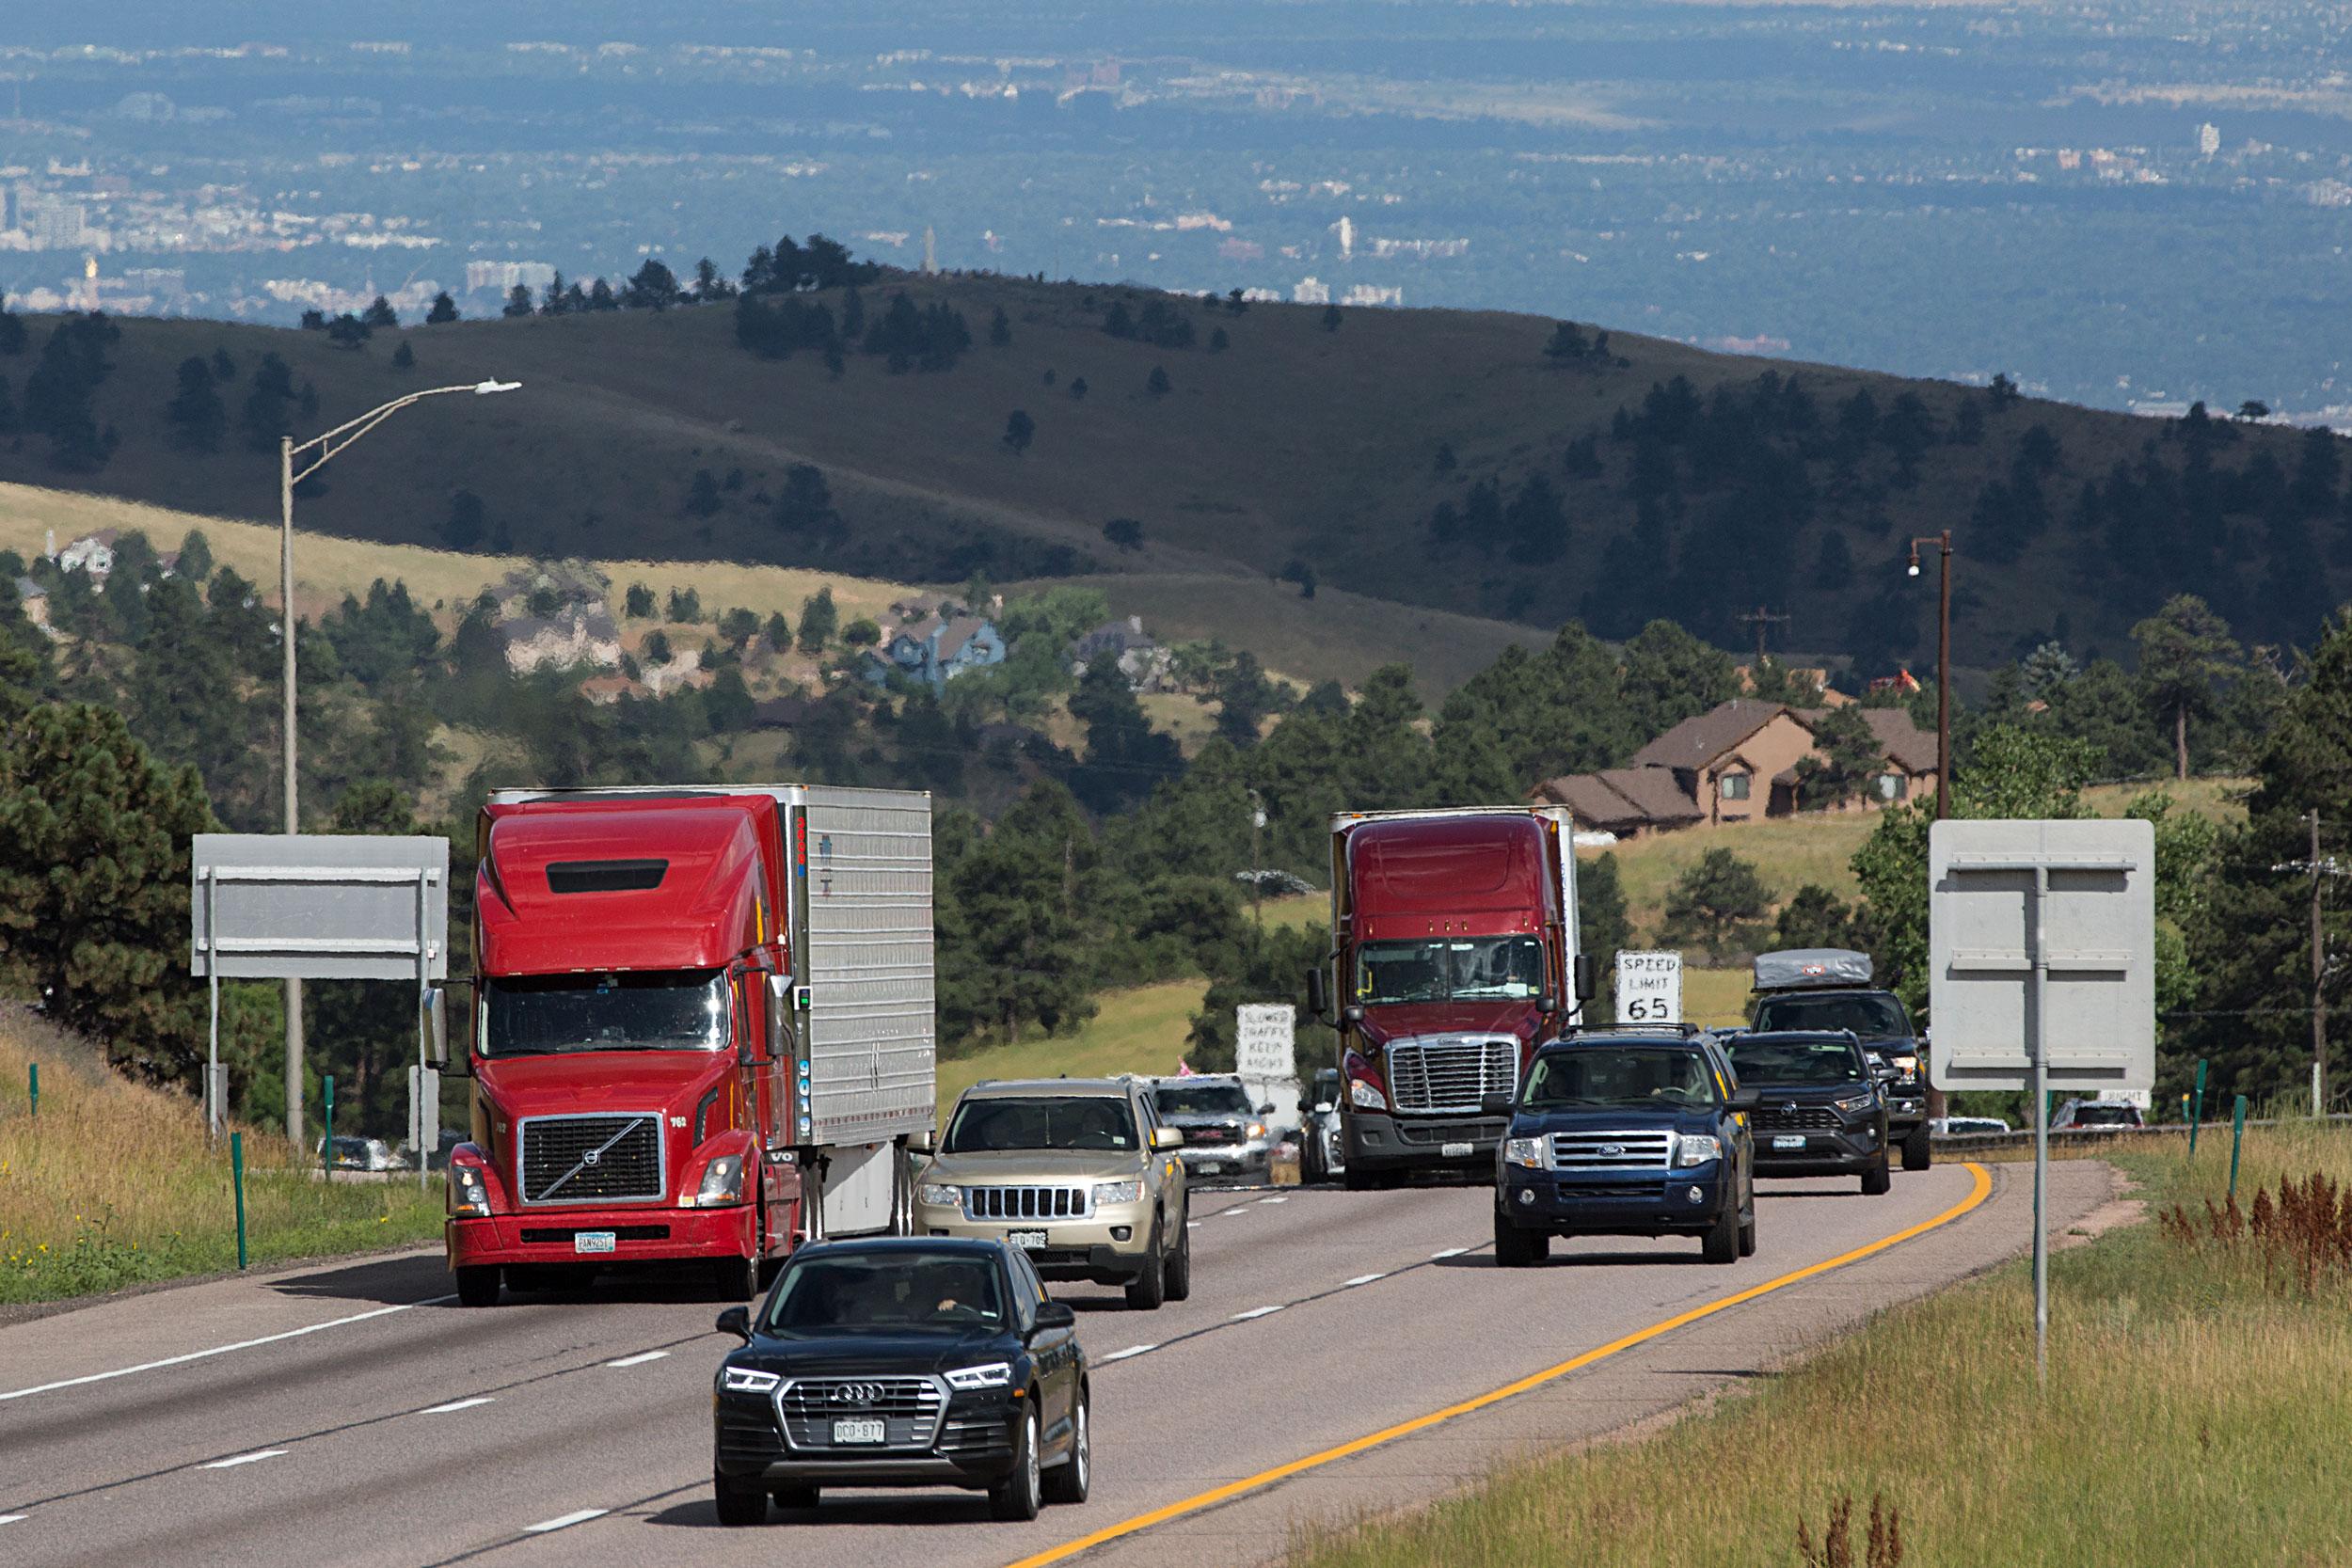 Interstate 70 Traffic Mt. Vernon Canyon